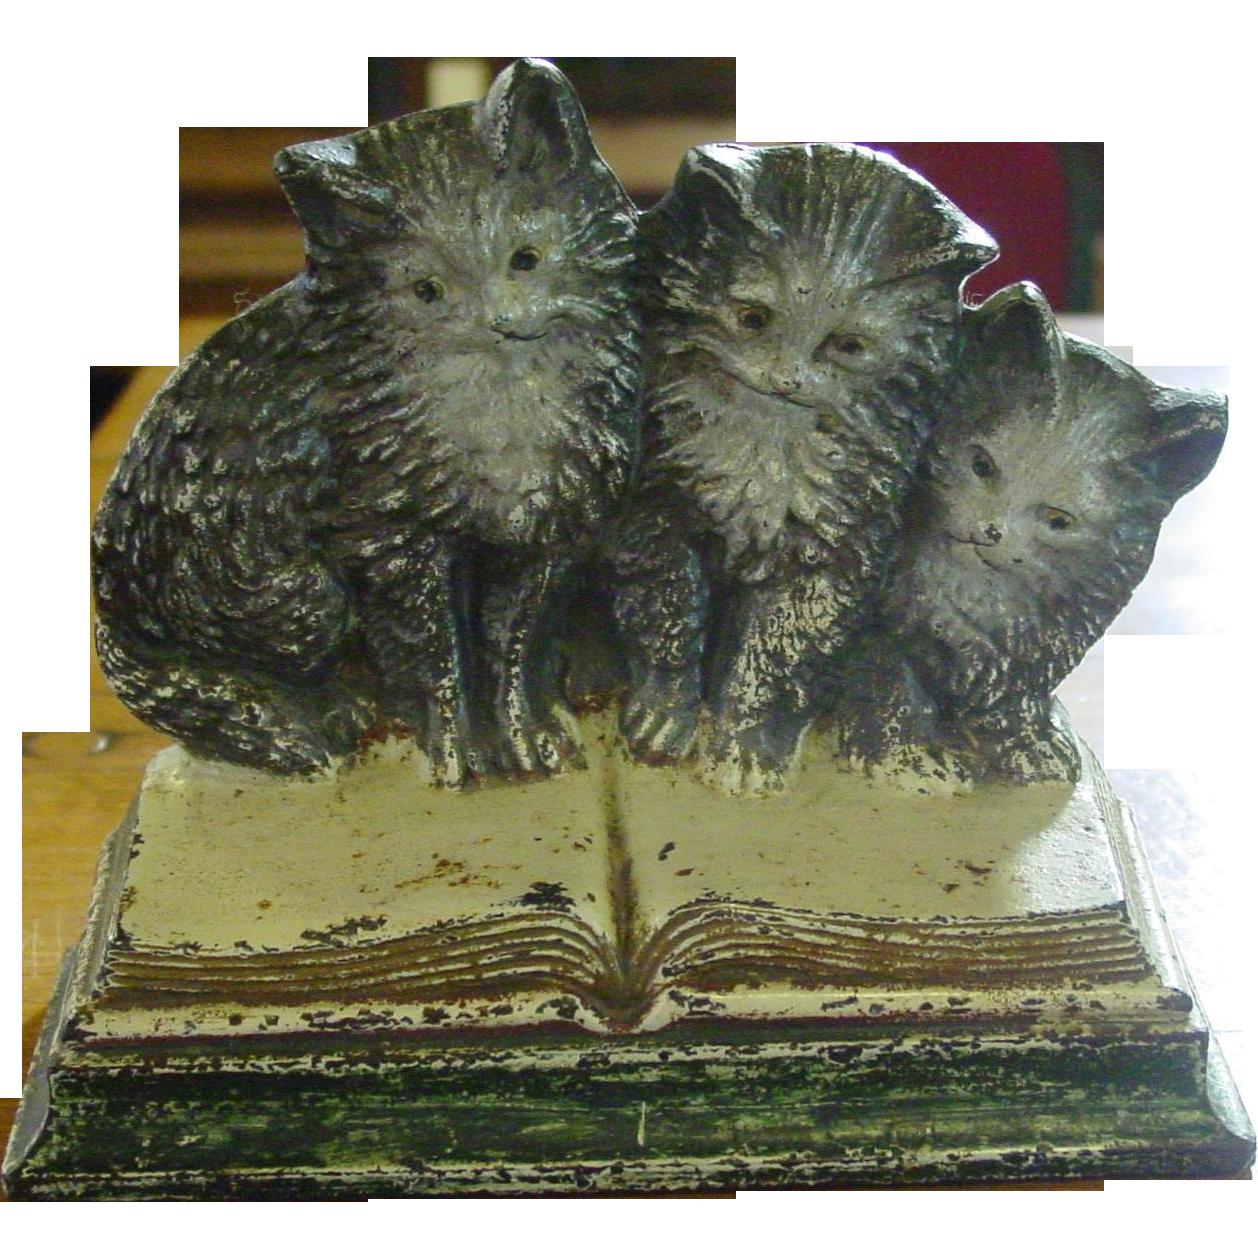 Cast iron doorstop 3 kittens bradley hubbard sold on ruby lane - Cast iron doorstop ...